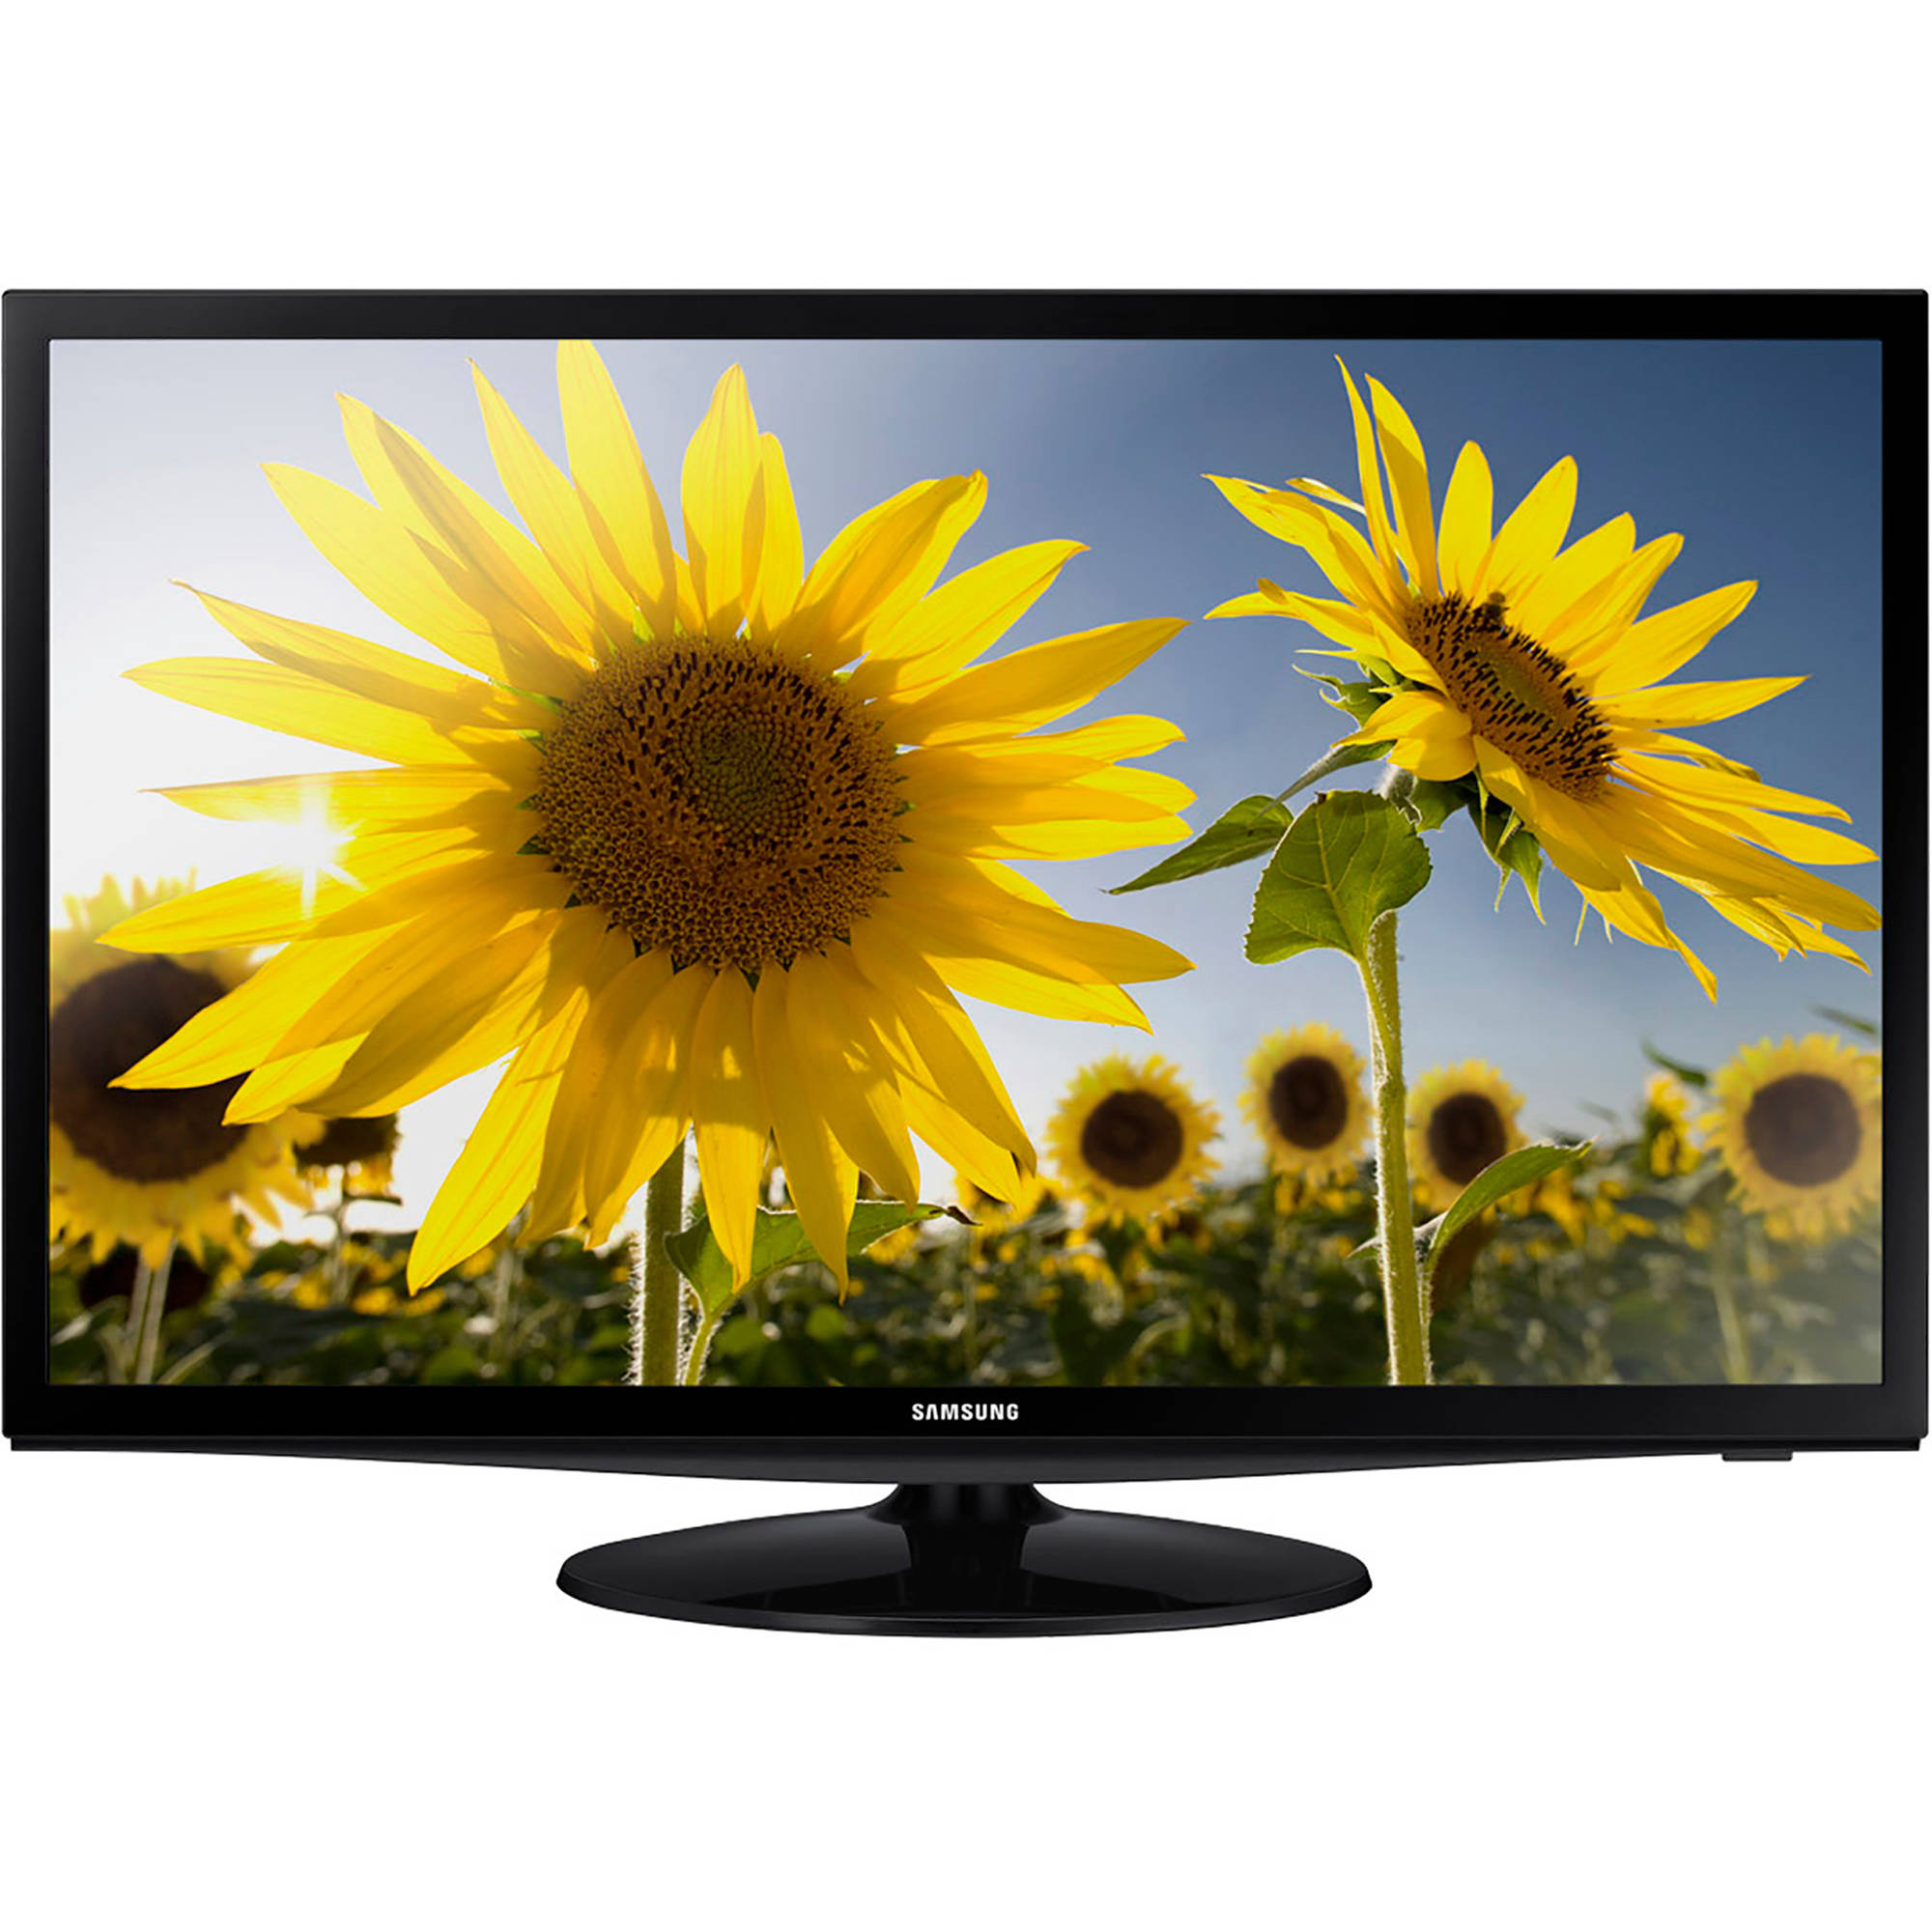 "SAMSUNG 28"" 4000 Series - HD LED TV - 720p, 120MR (Model#: UN28H4000)"